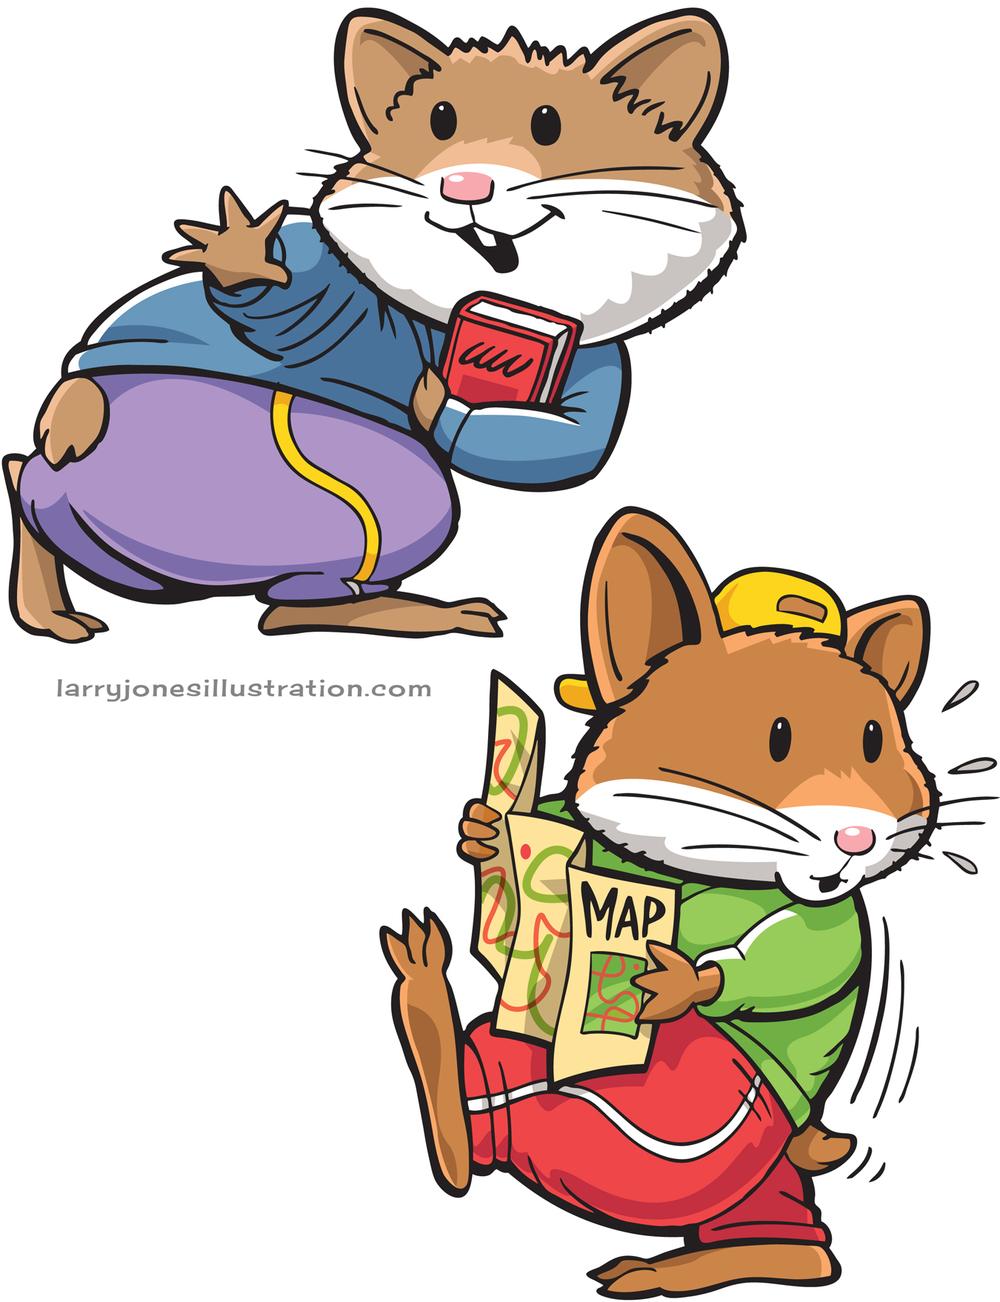 hamsters-characters-poses.jpg